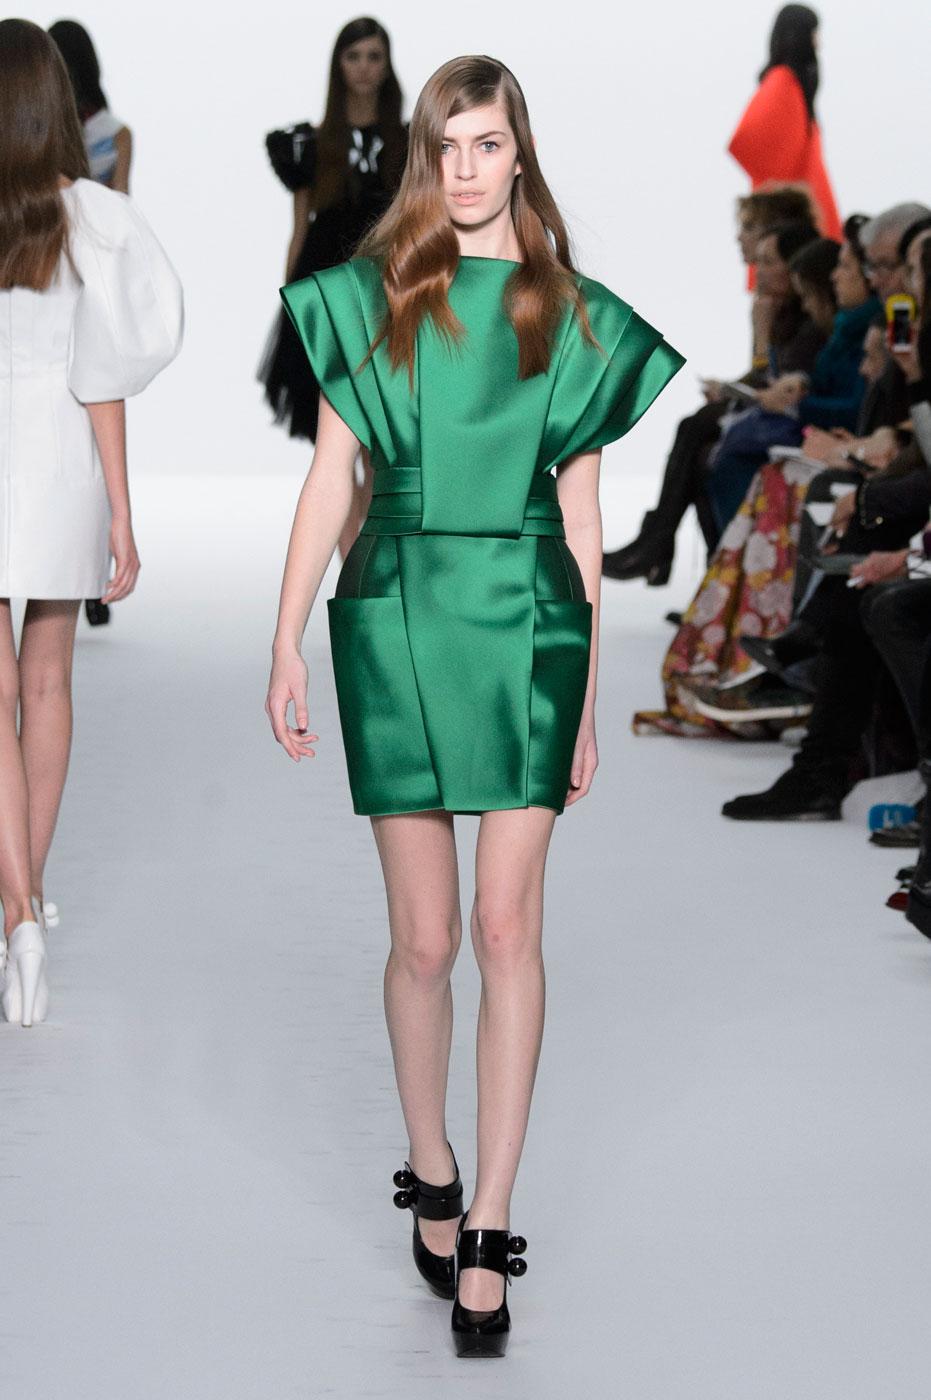 Kayek-fashion-runway-show-haute-couture-paris-spring-summer-2015-the-impression-31